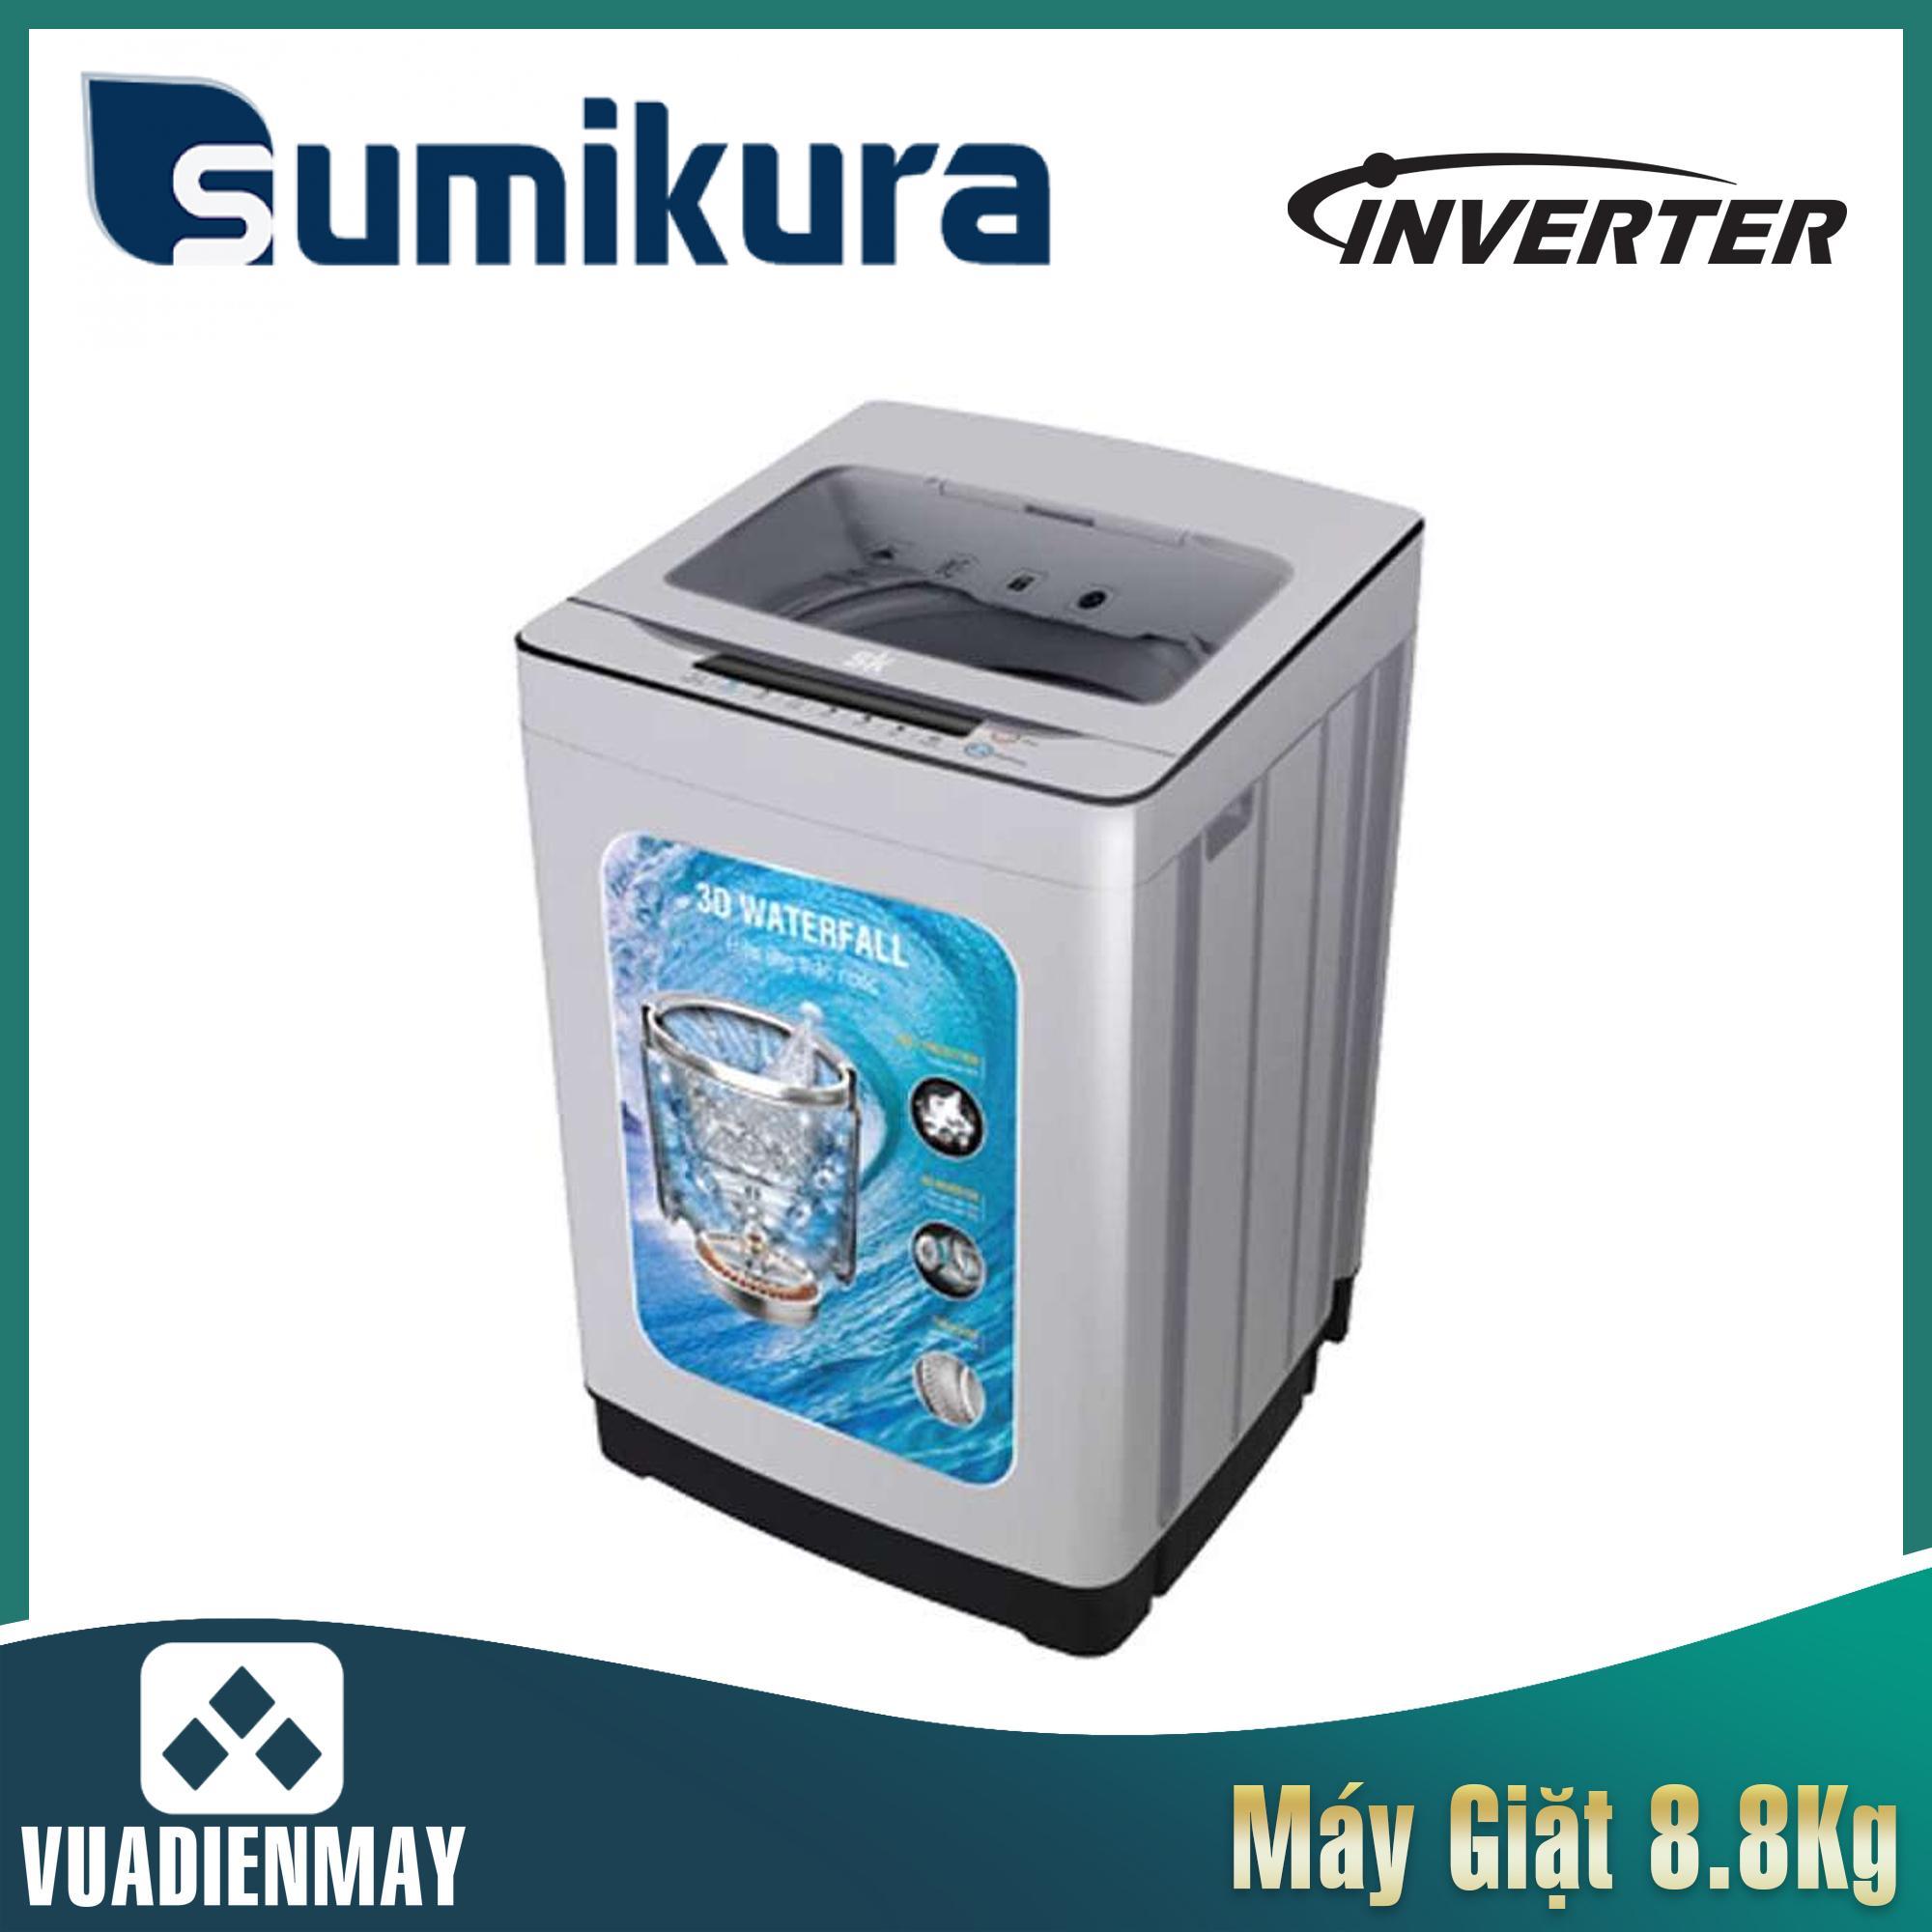 Máy giặt Sumikura  8.8kg lồng đứng Inverter